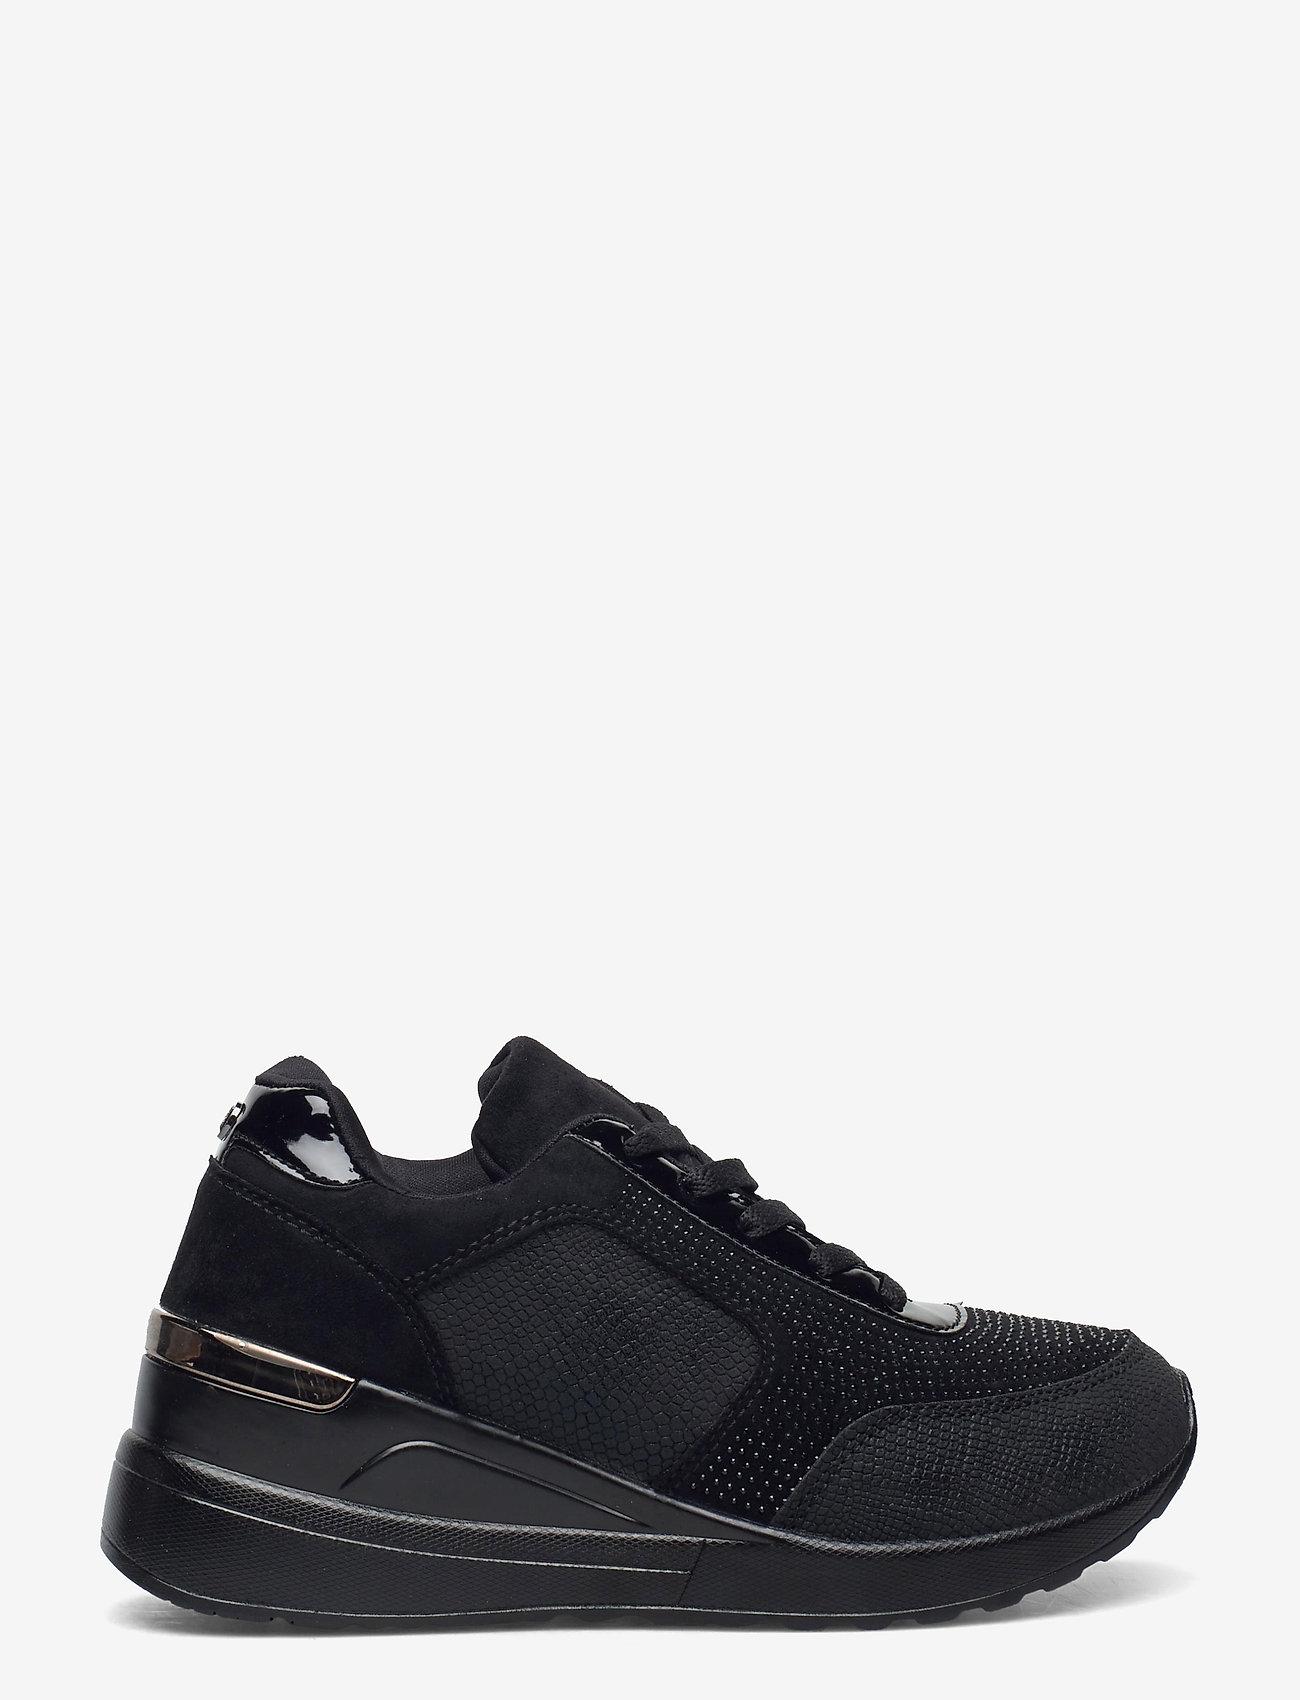 Dune London - ERIQA - lage sneakers - black - 1